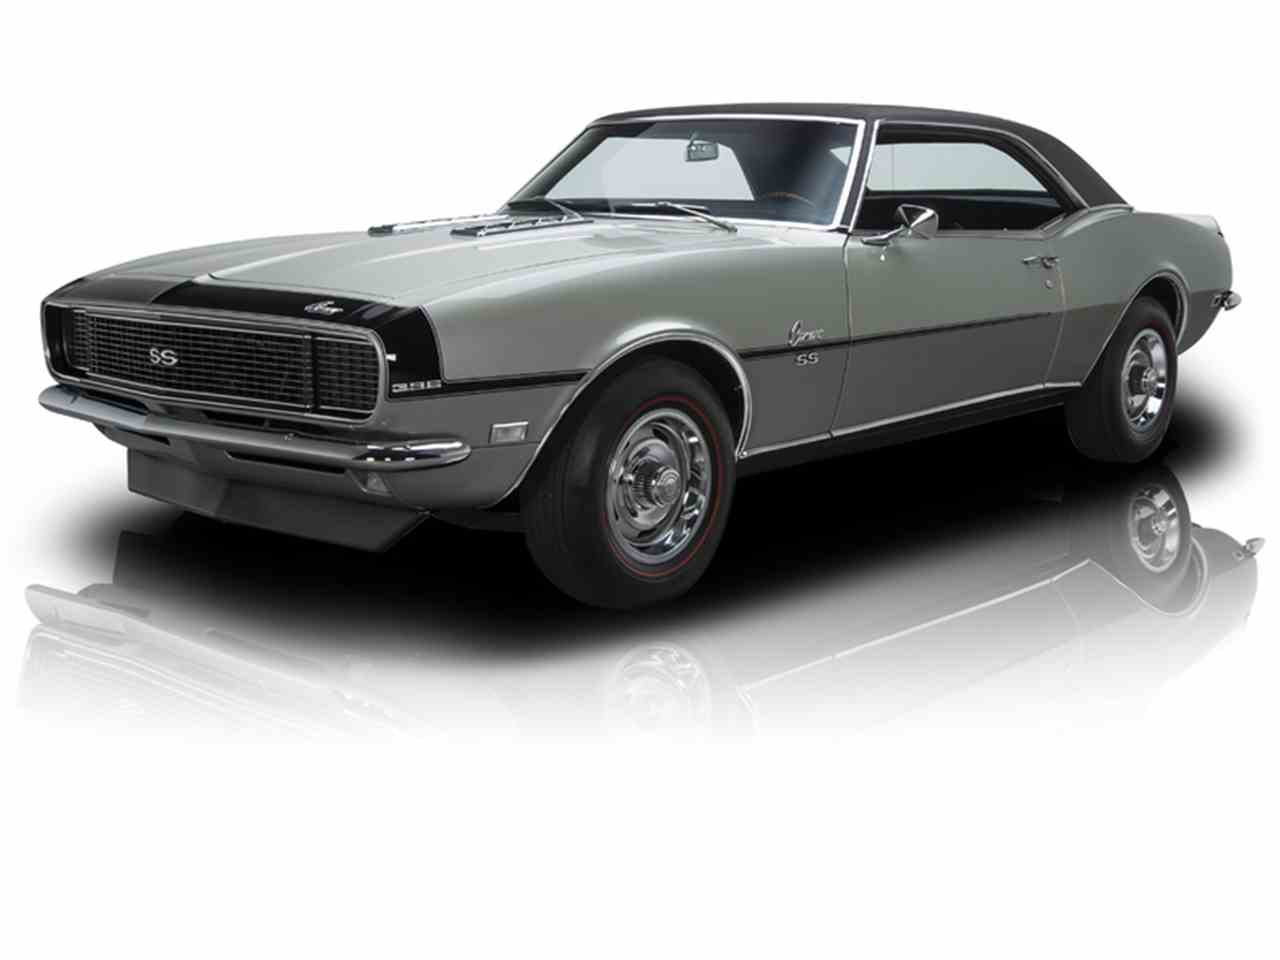 1968 Chevrolet Camaro Rs Ss For Sale Classiccars Com